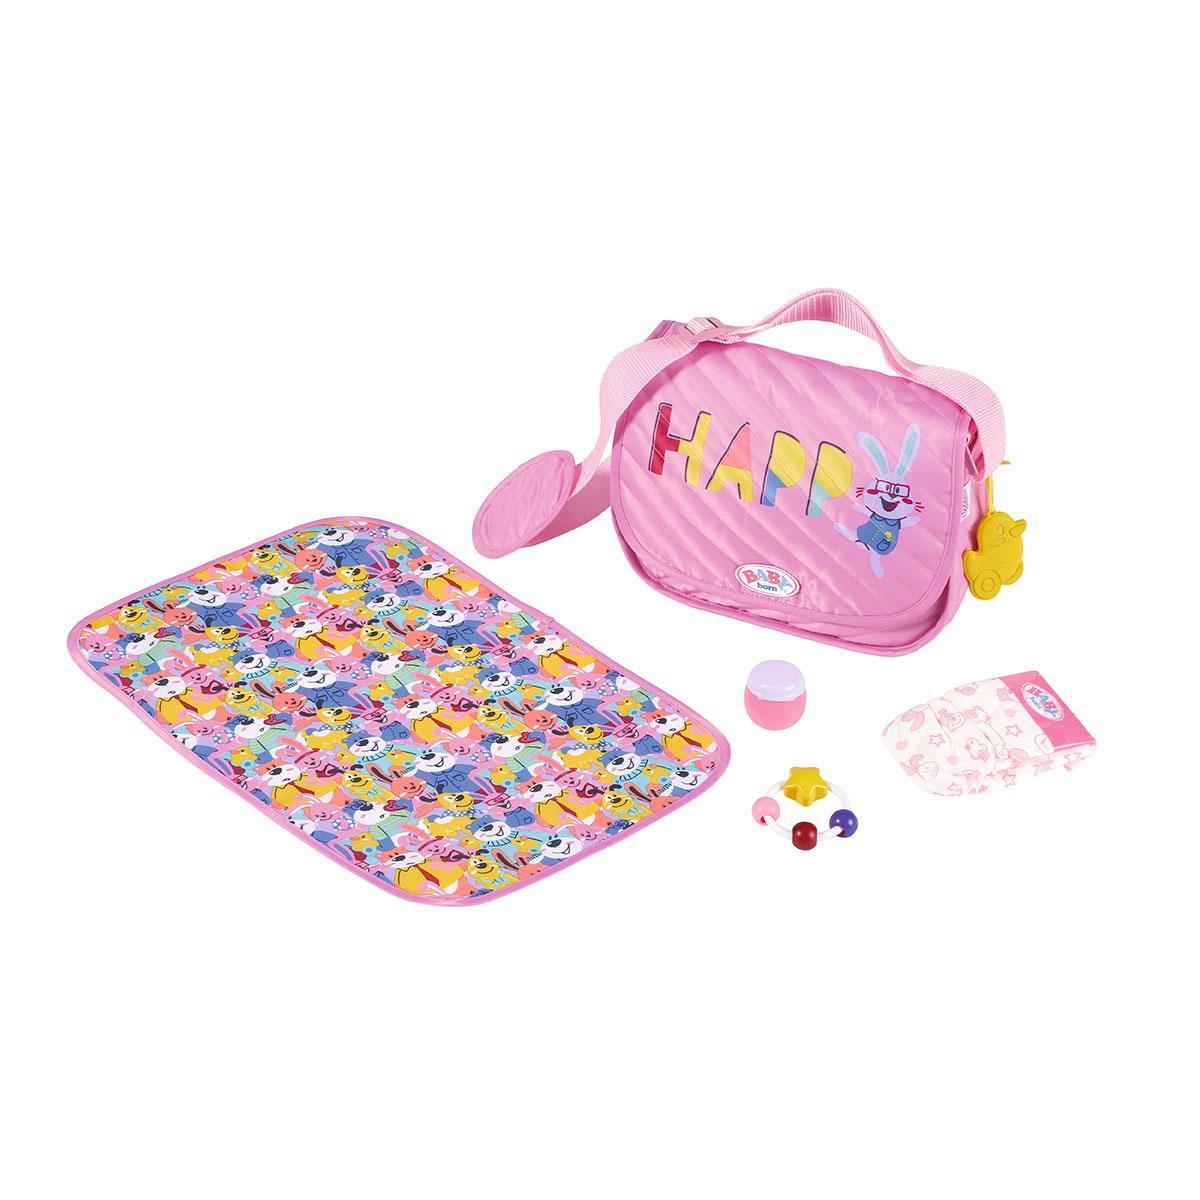 Сумка для куклы BABY Born - Забота о малыше ZAPF CREATION 828021